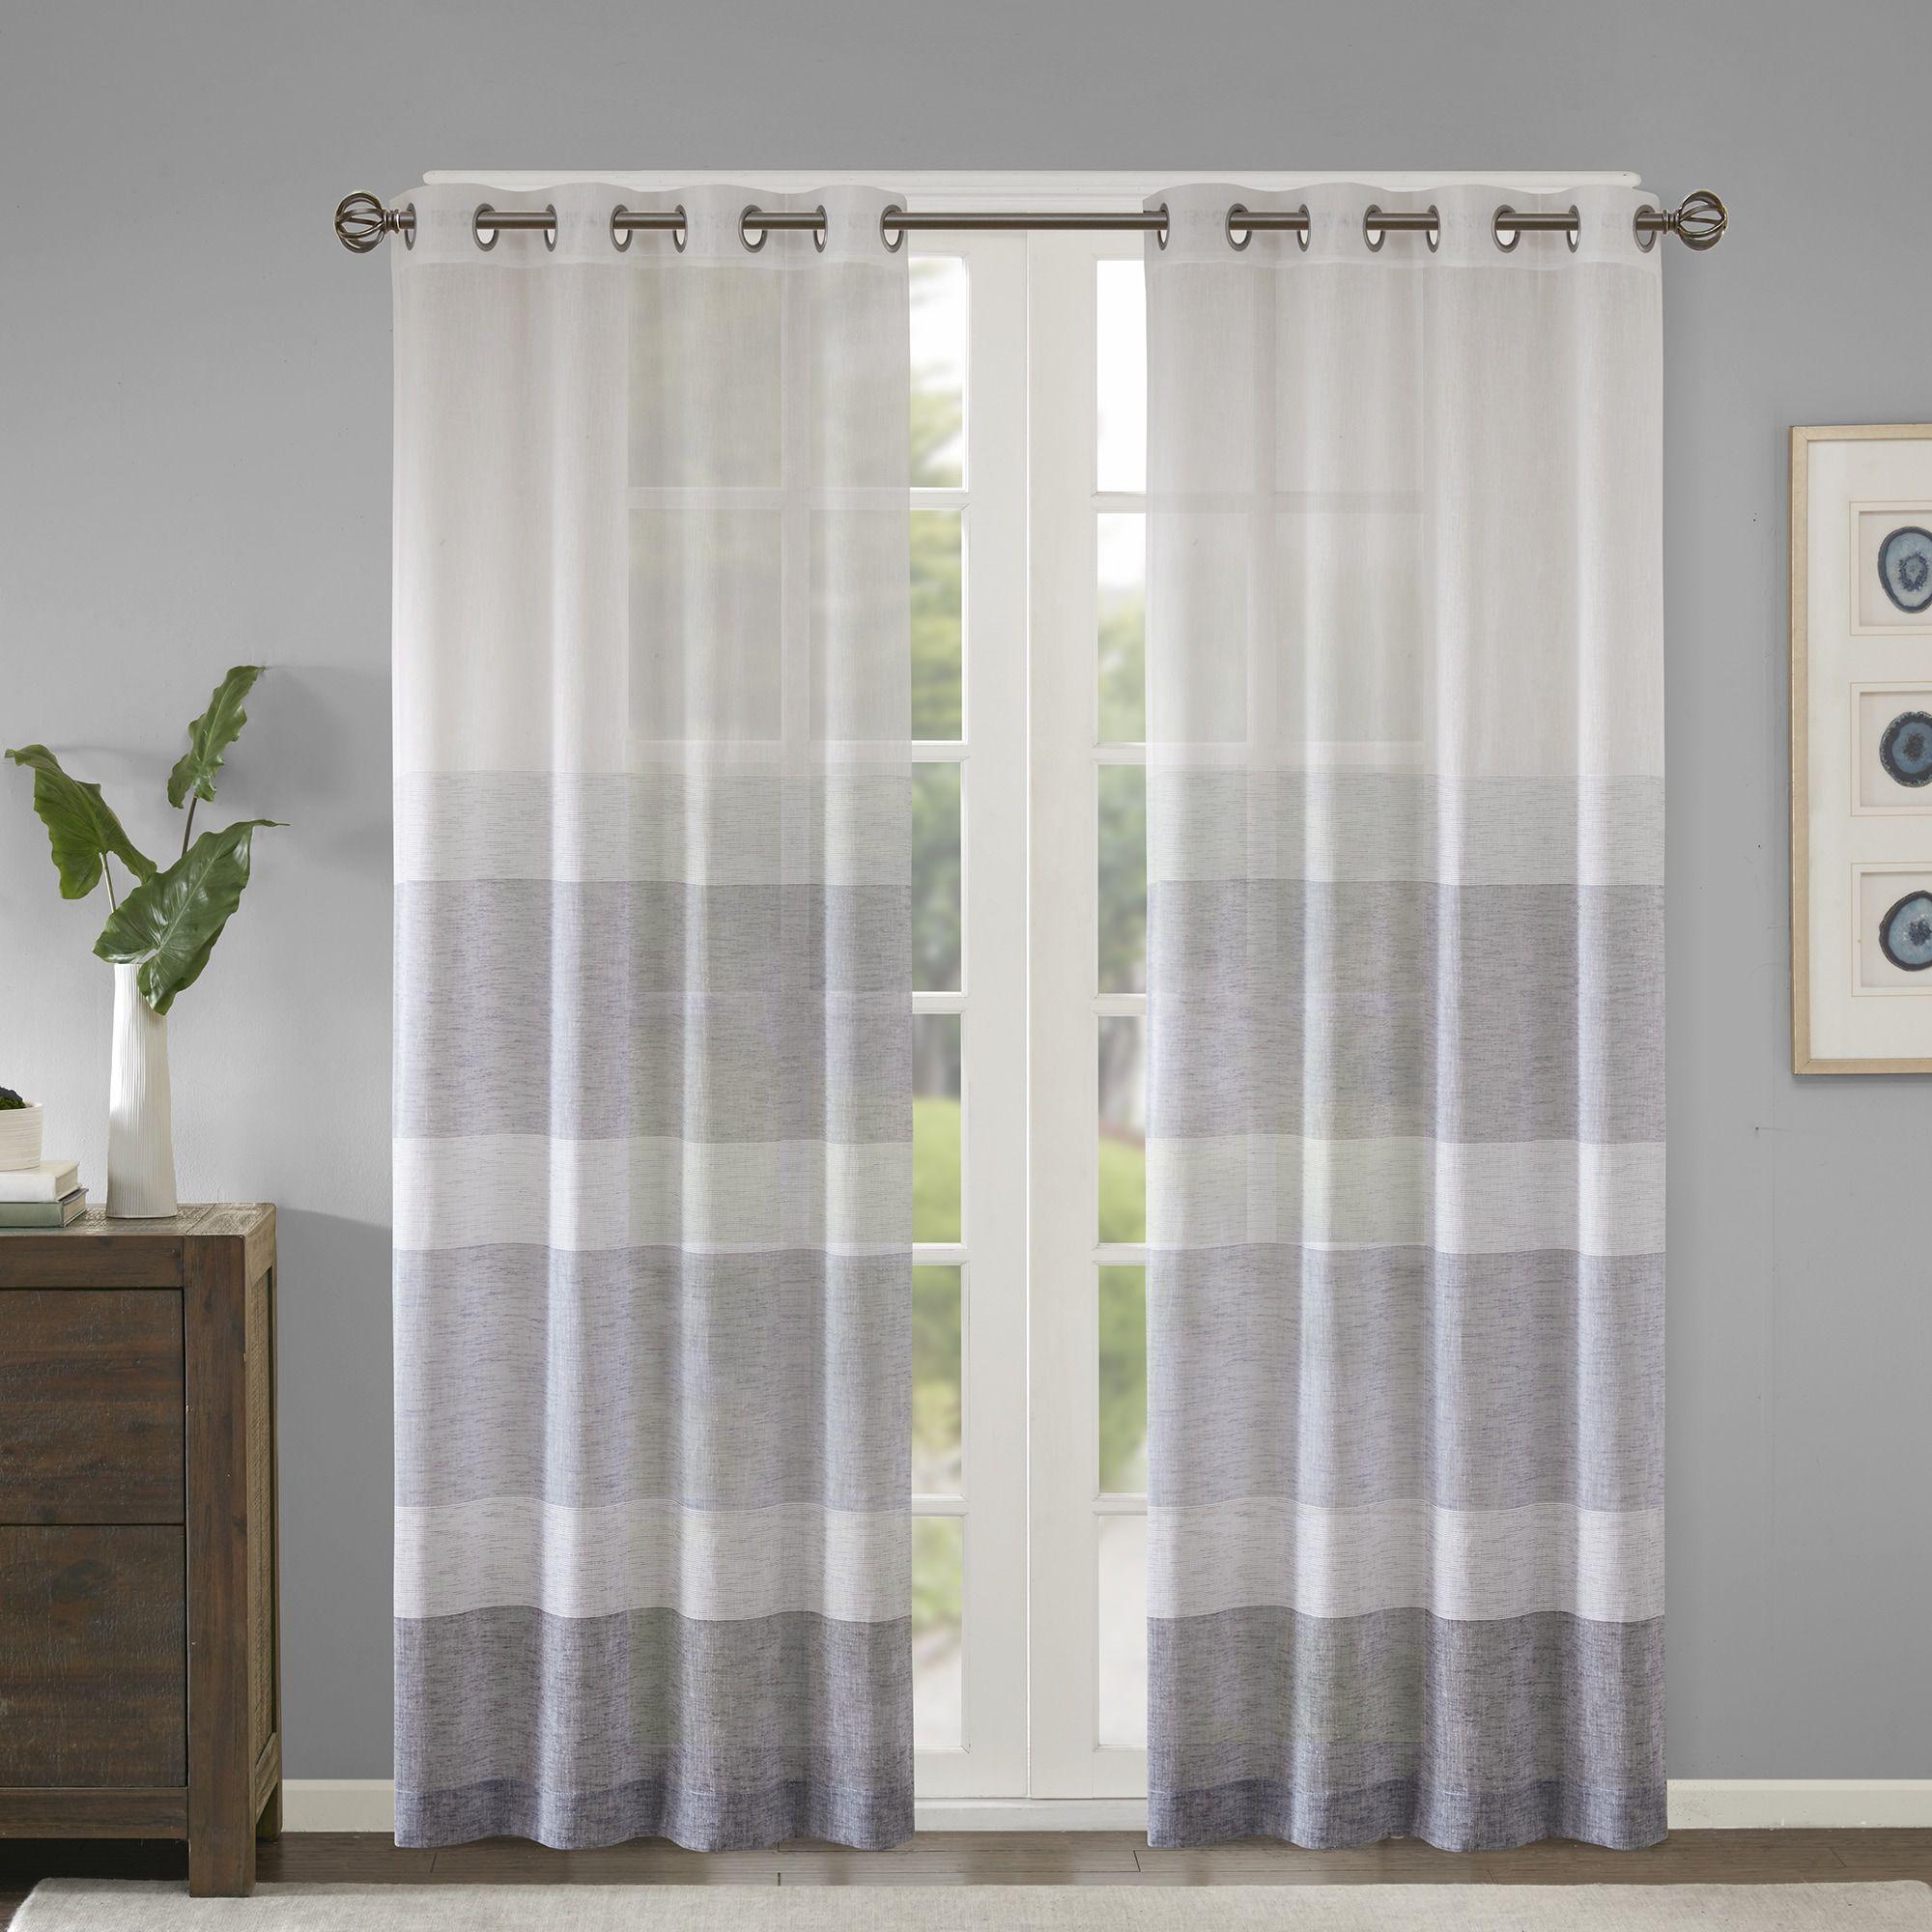 Madison Park Jasper Woven Sheer Curtain Panel 118 Dowse